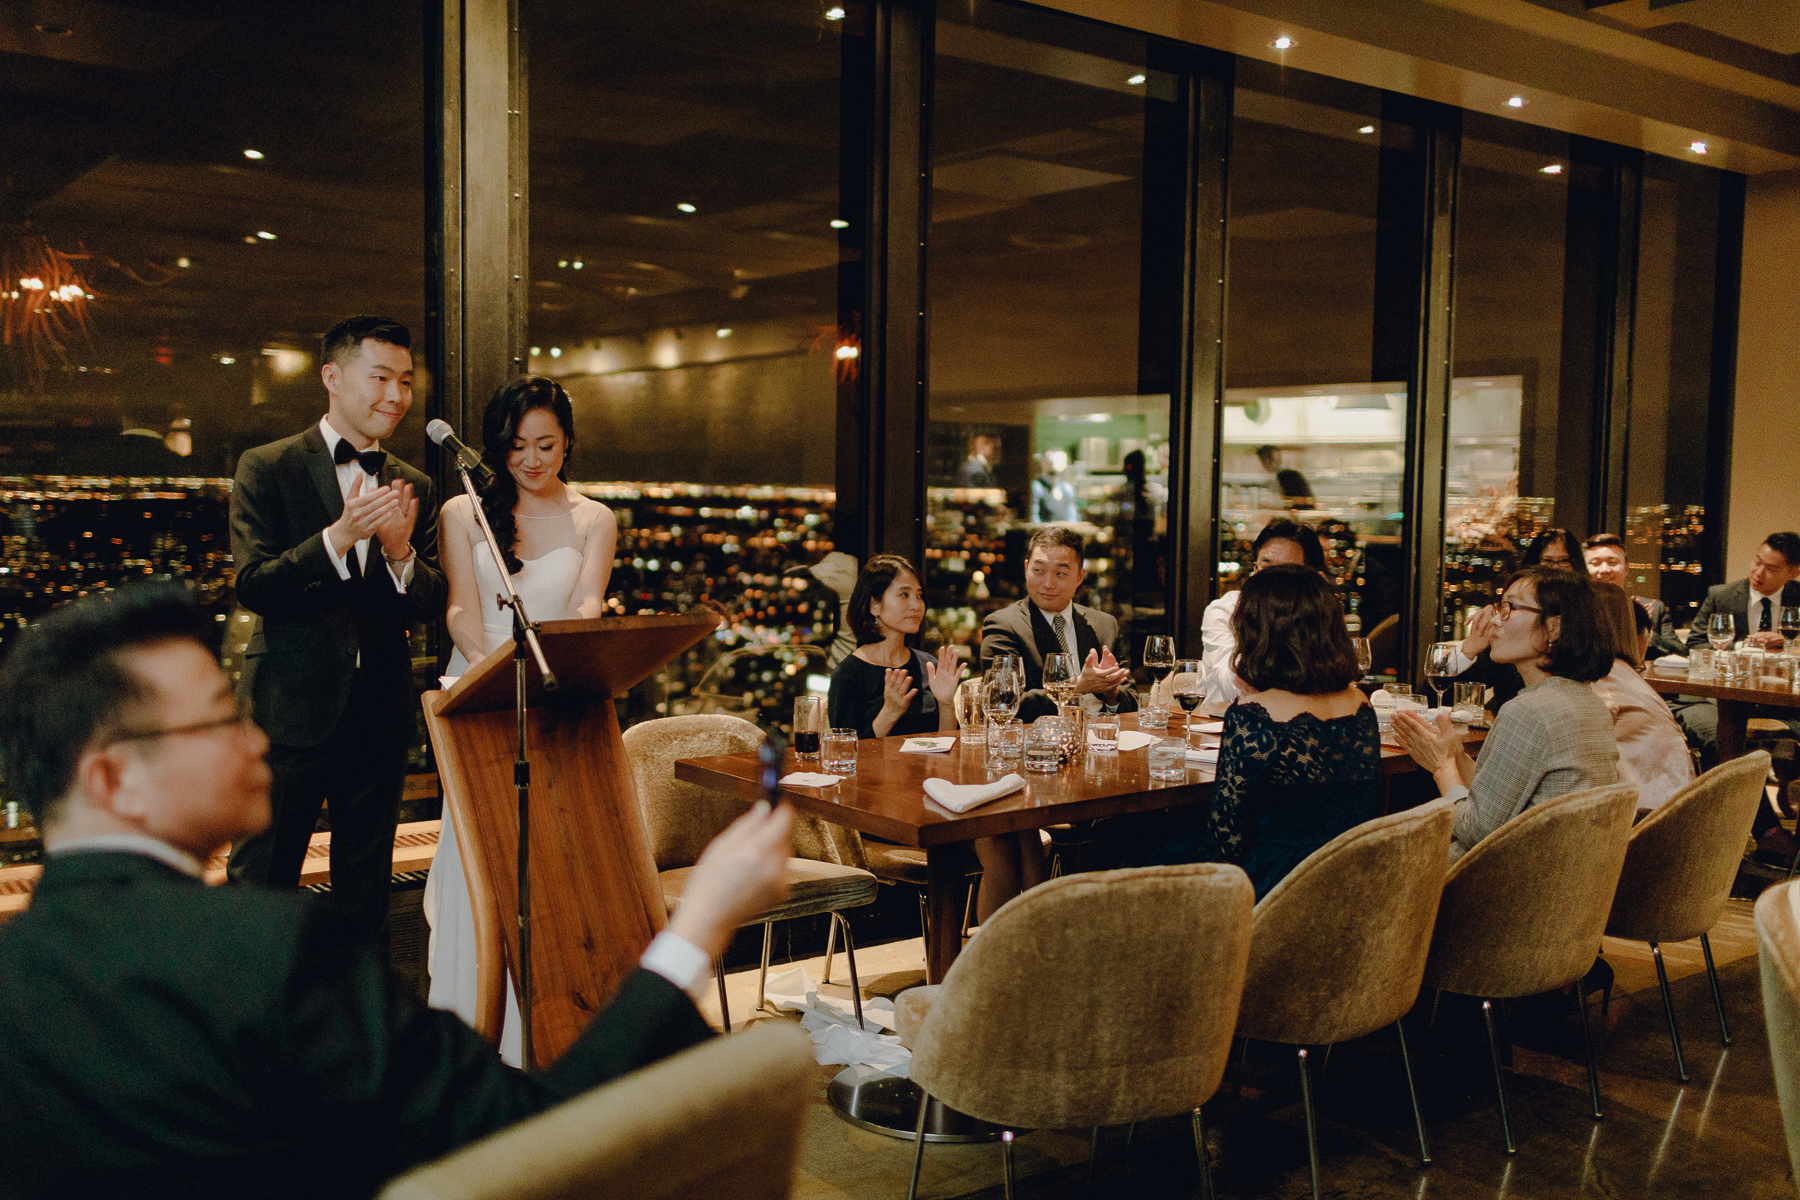 cannoe-restaurannt-wedding 0097.jpg